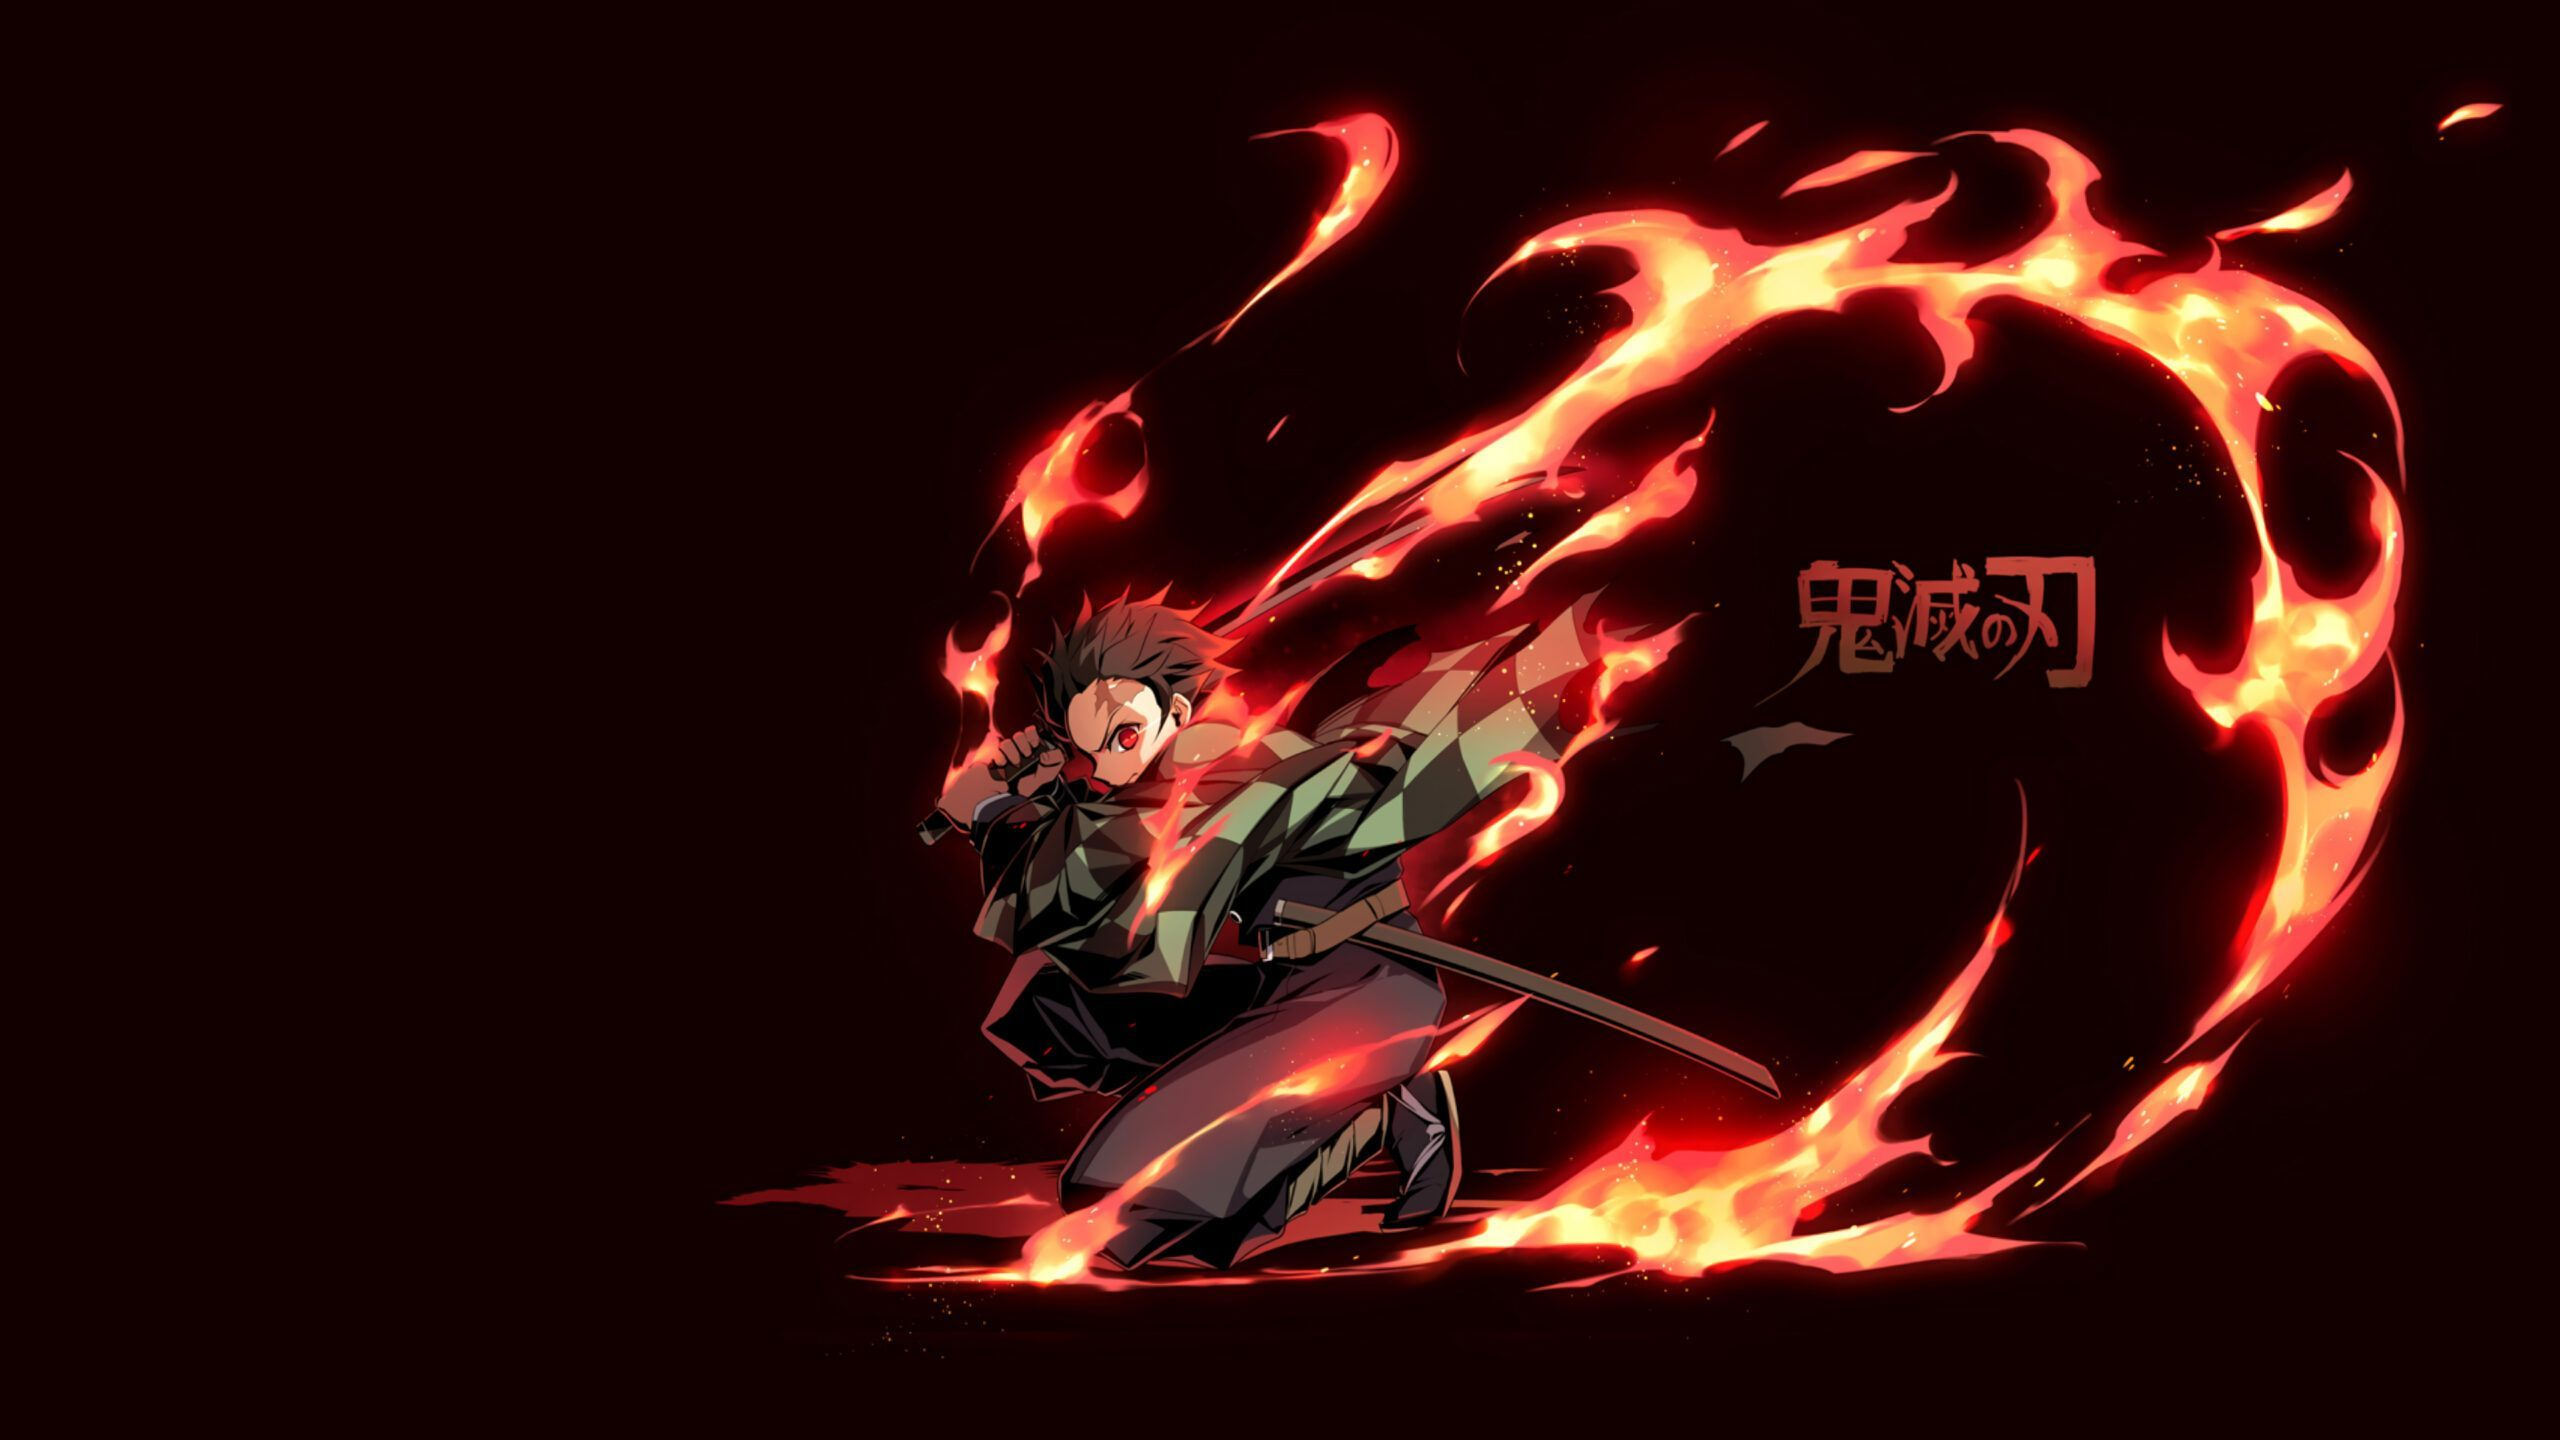 Demon Slayer Anime Wallpapers   Wallpaper Cave